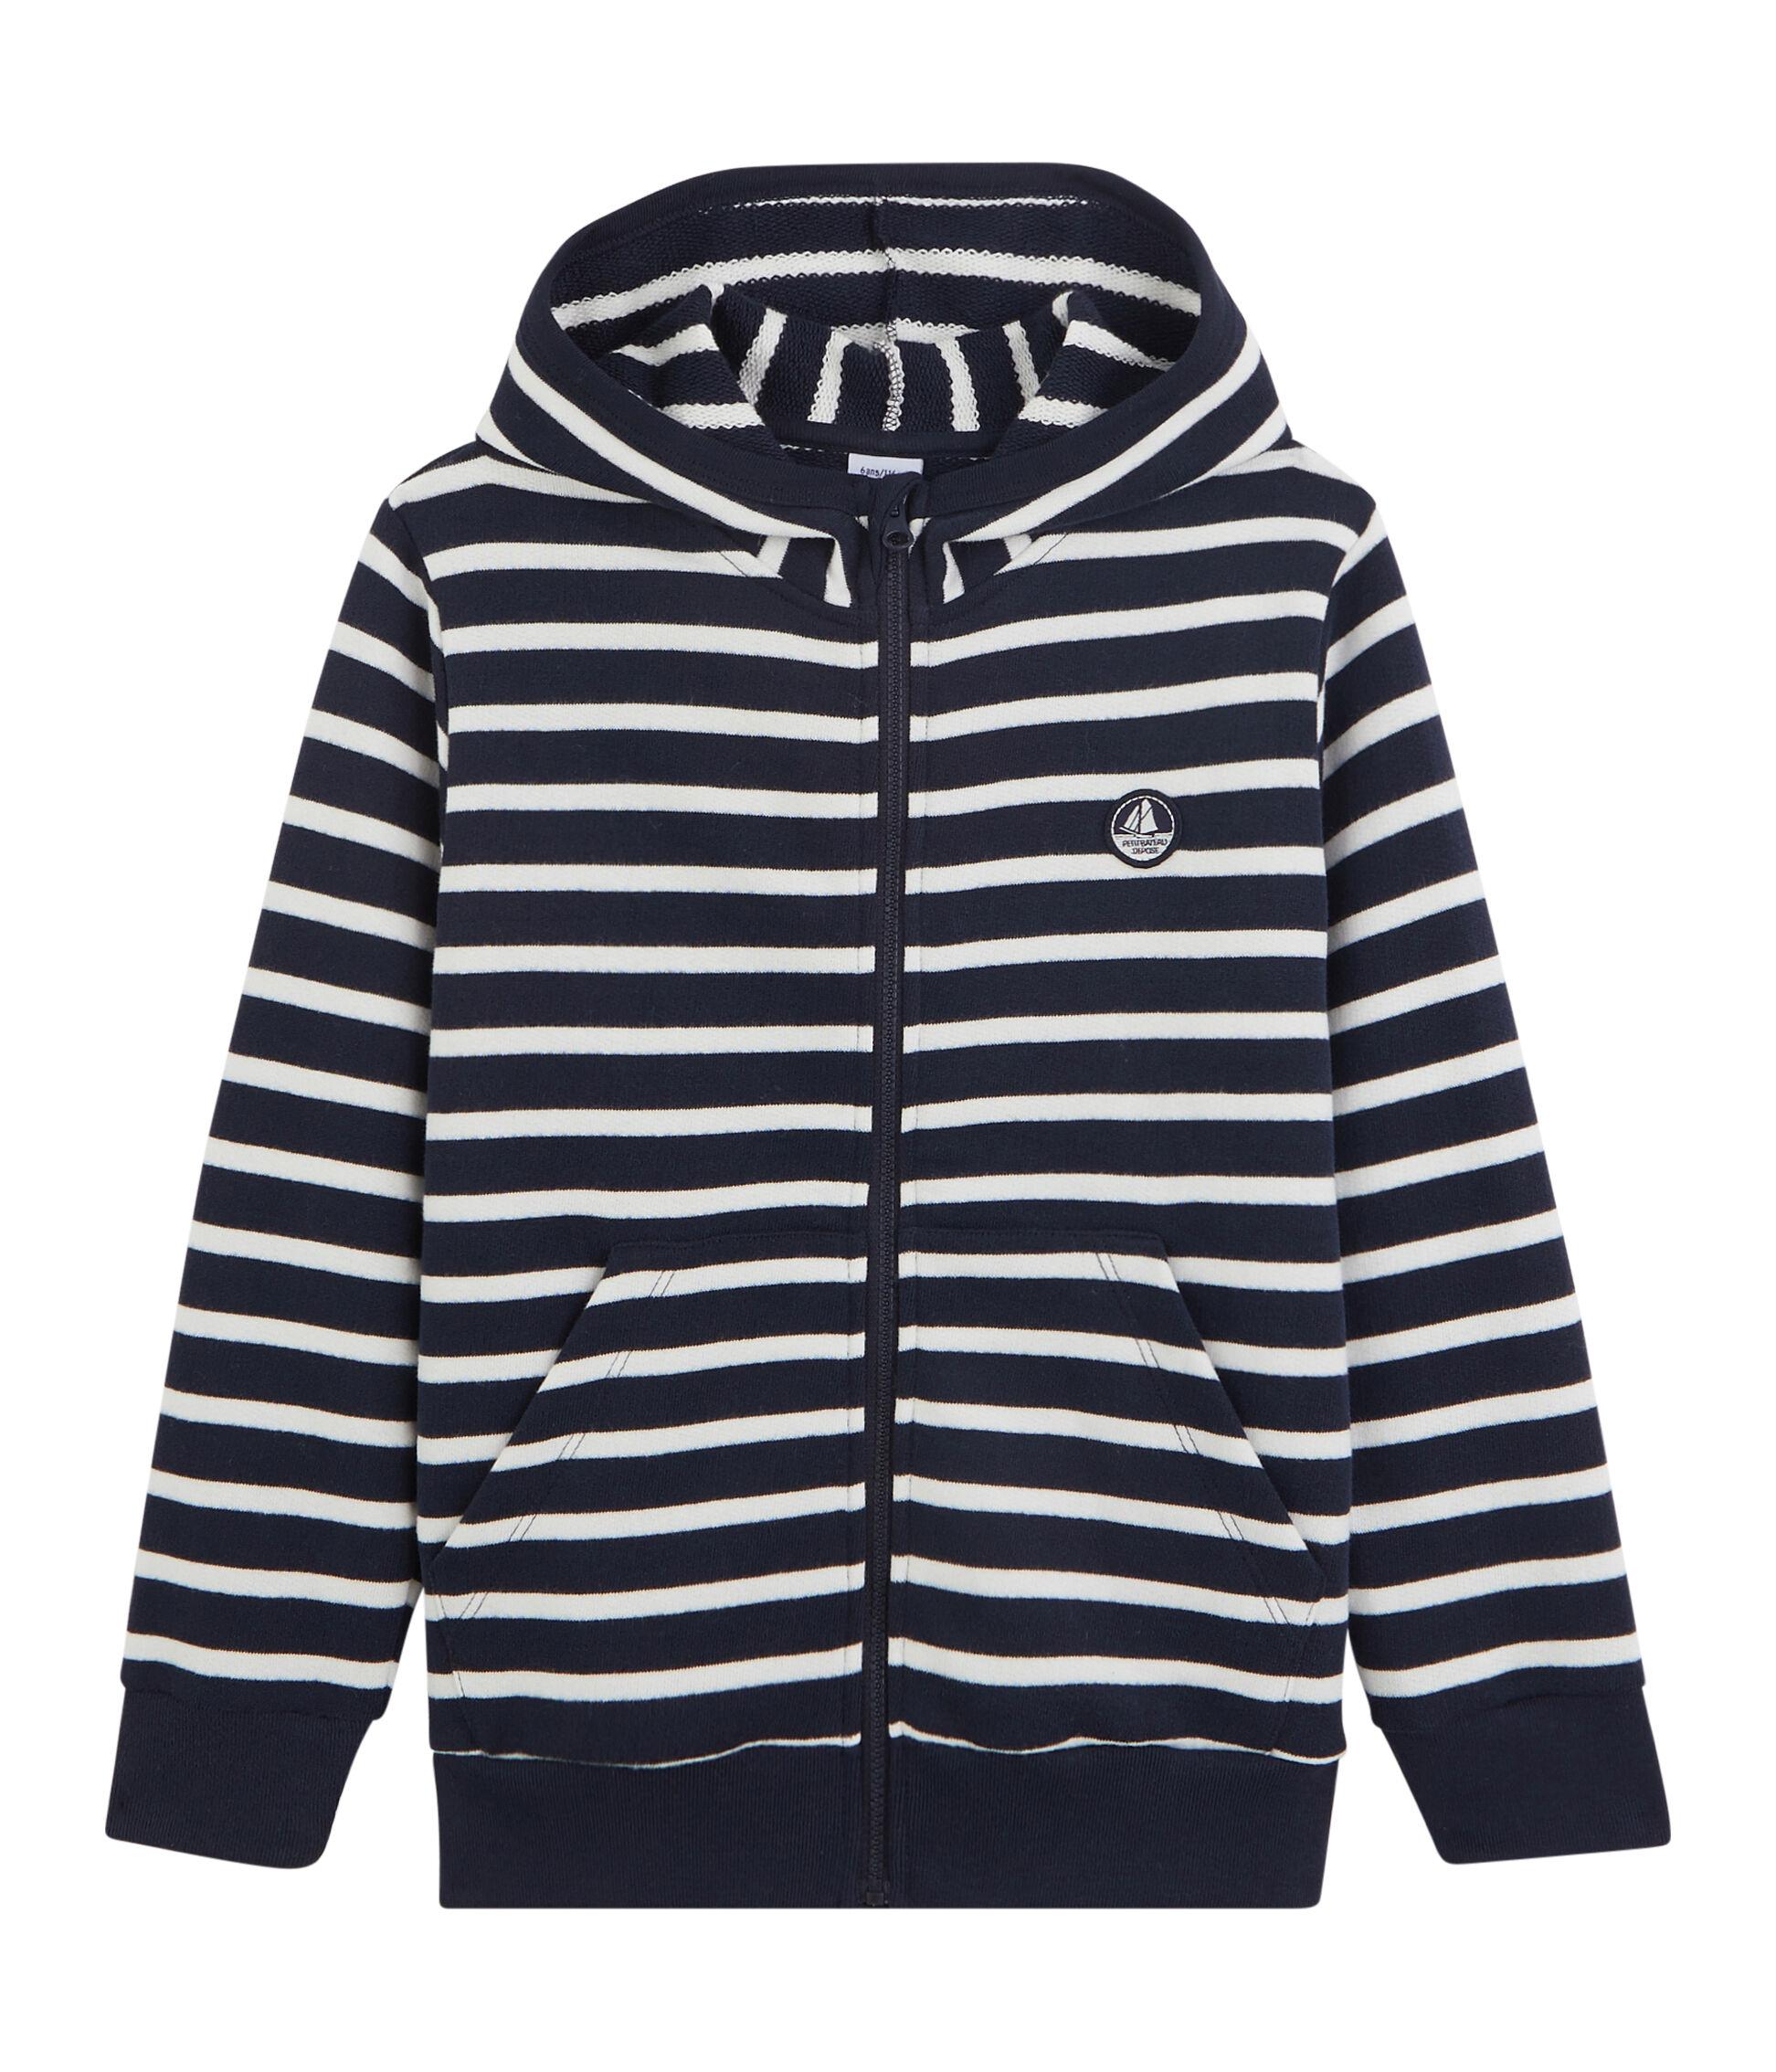 Petit Bateau Baby Boy Hooded Sweatshirt